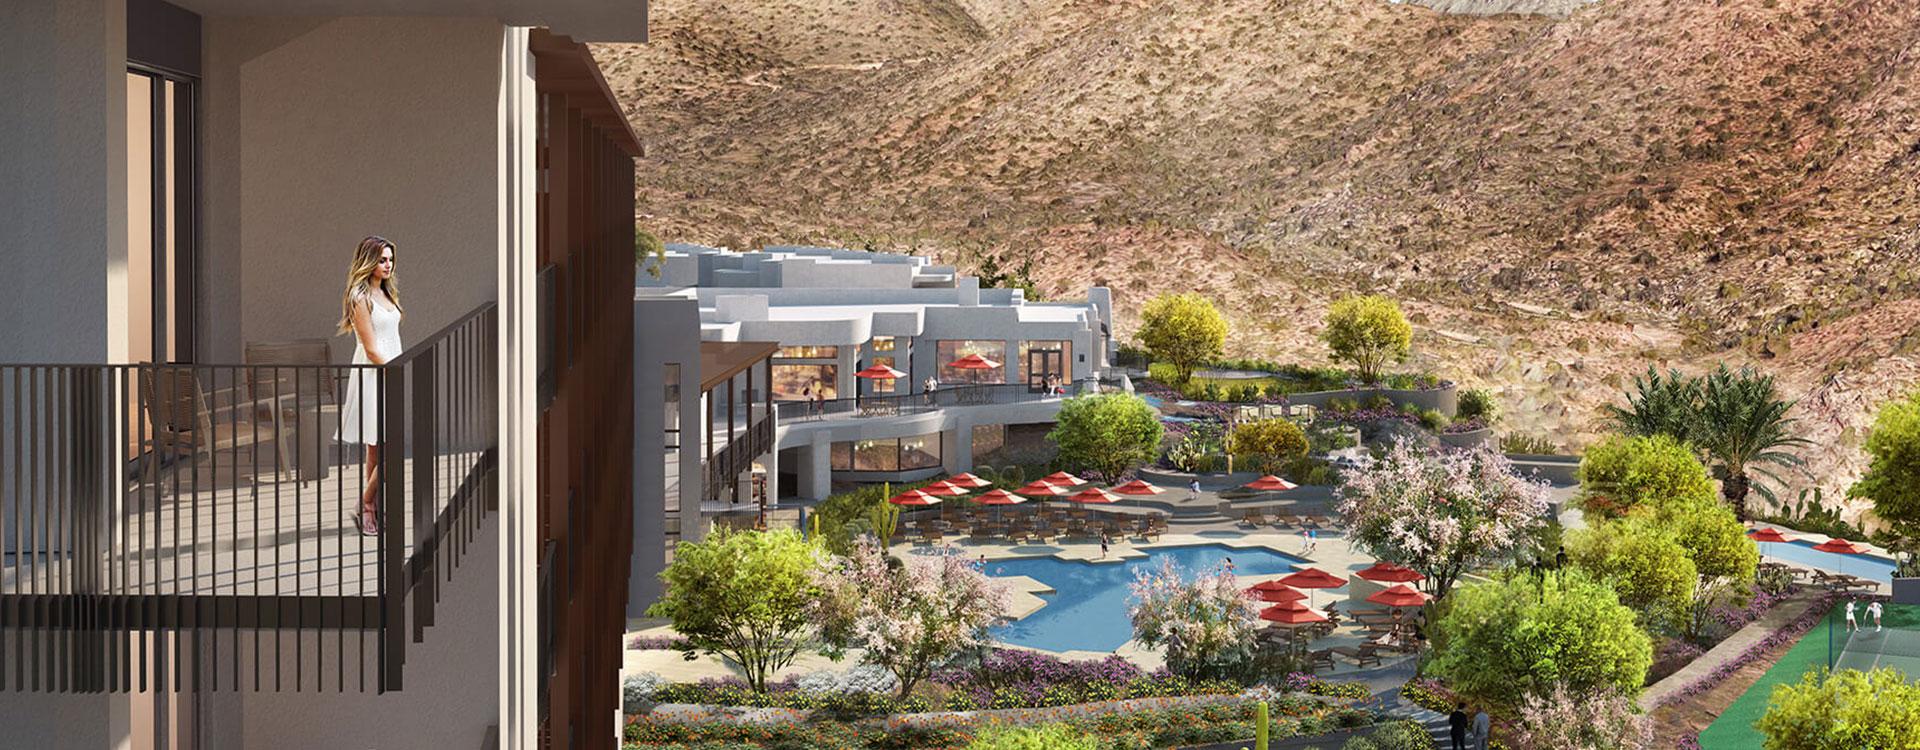 Rooms & Suites of Hotel ADERO Scottsdale